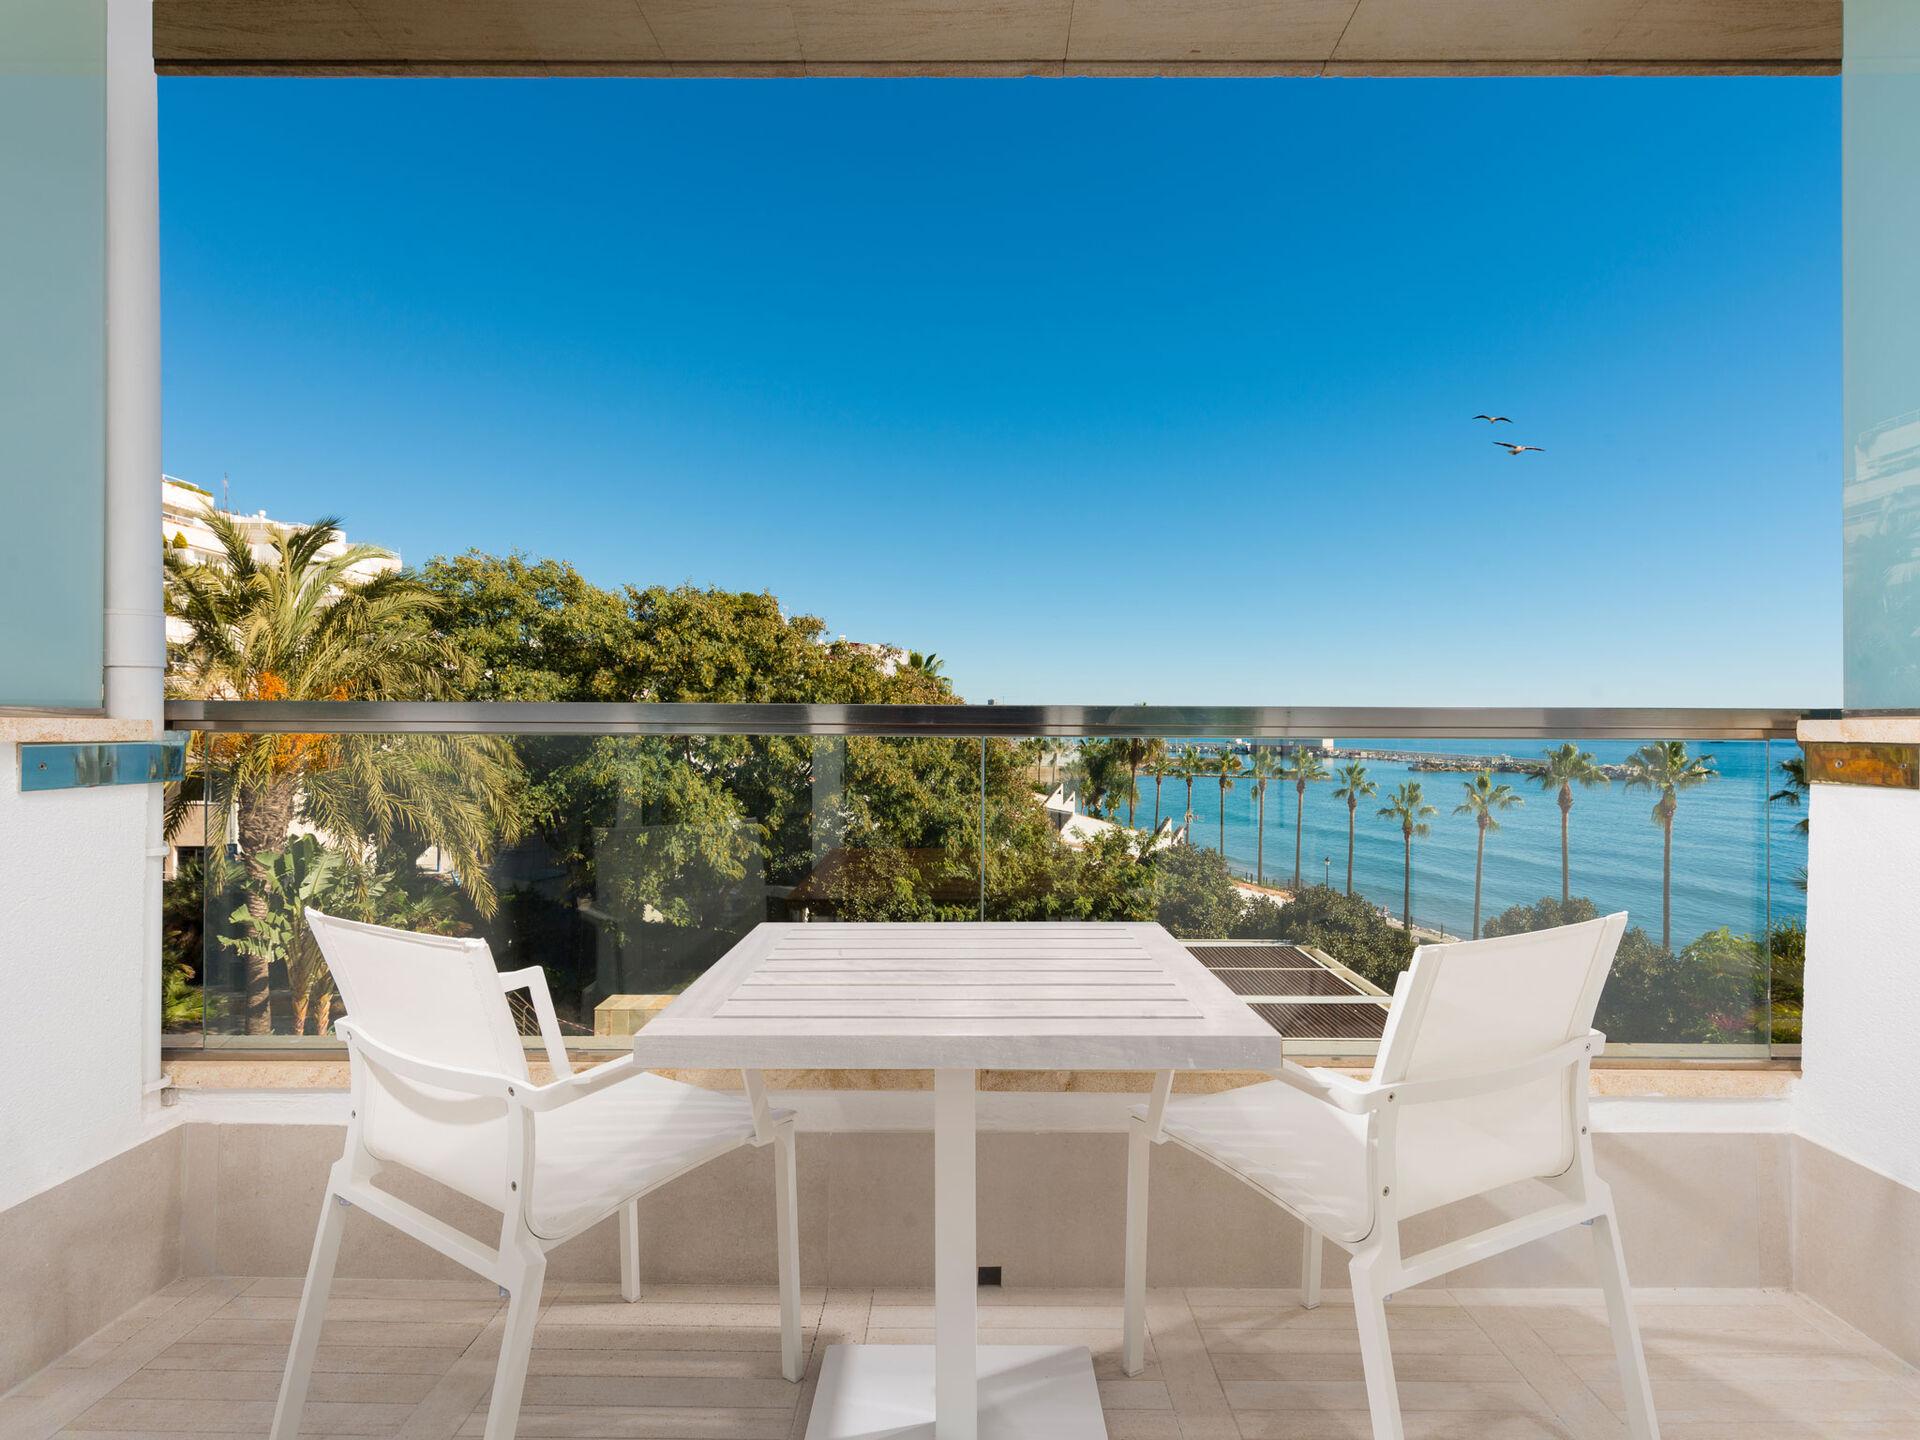 https://cms.satur.sk/data/imgs/tour_image/orig/amare-marbella-habitaciones-keep-the-secret-hab-terraza-1972147.jpg